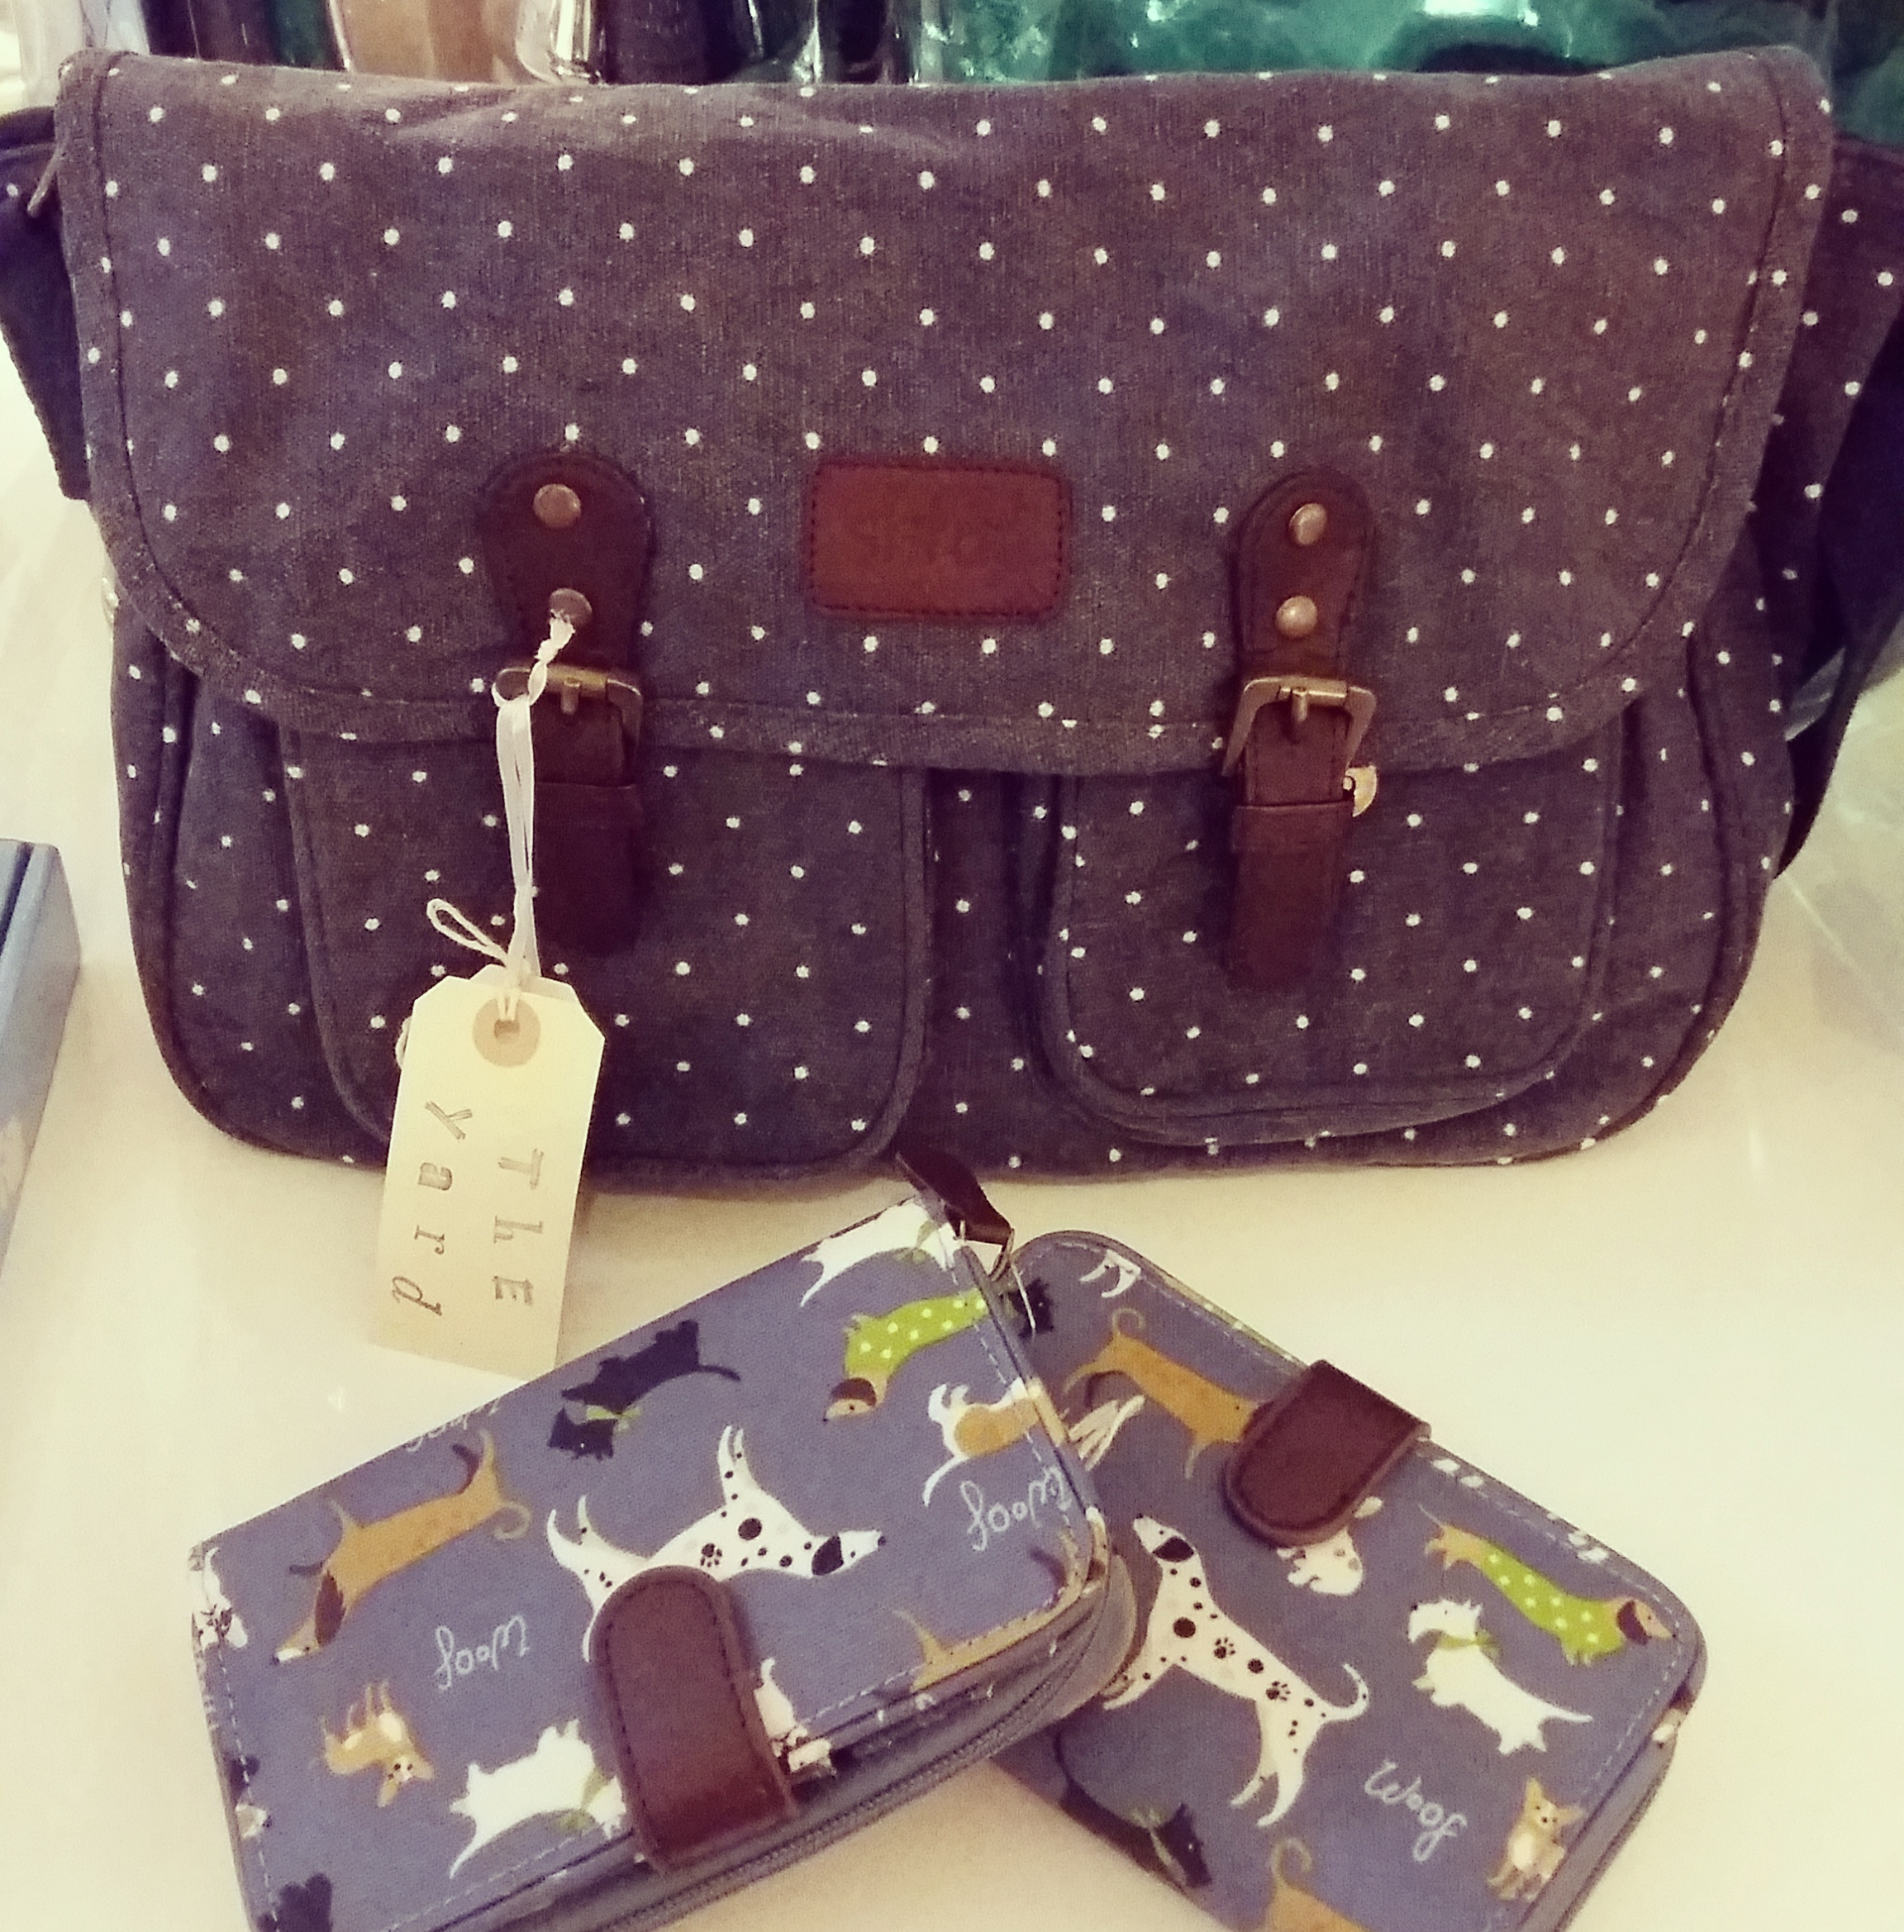 Navy polka dot satchel and dog print oil cloth purses